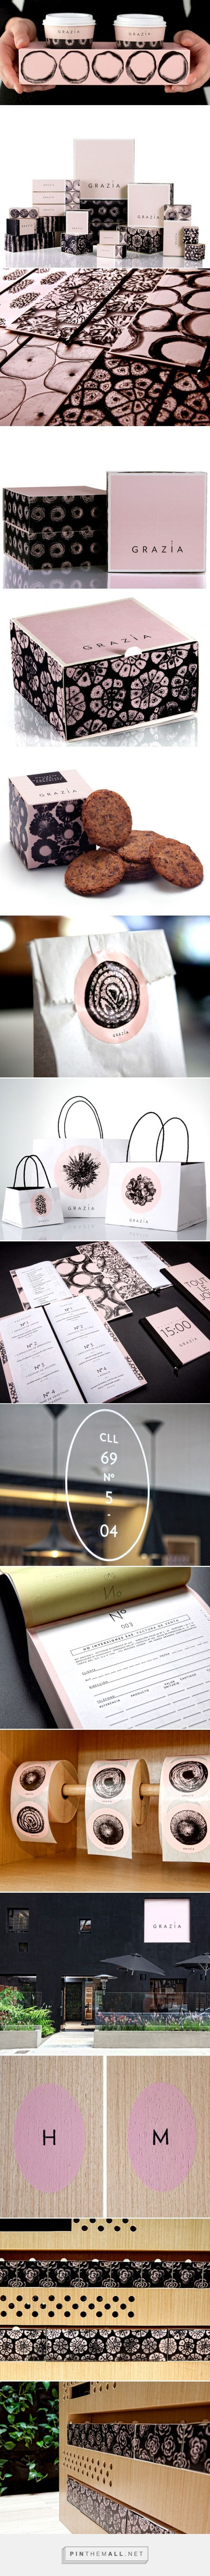 Grazia Branding | Fivestar Branding – Design and Branding Agency & Inspiration Gallery | Professional Logo and Website Design